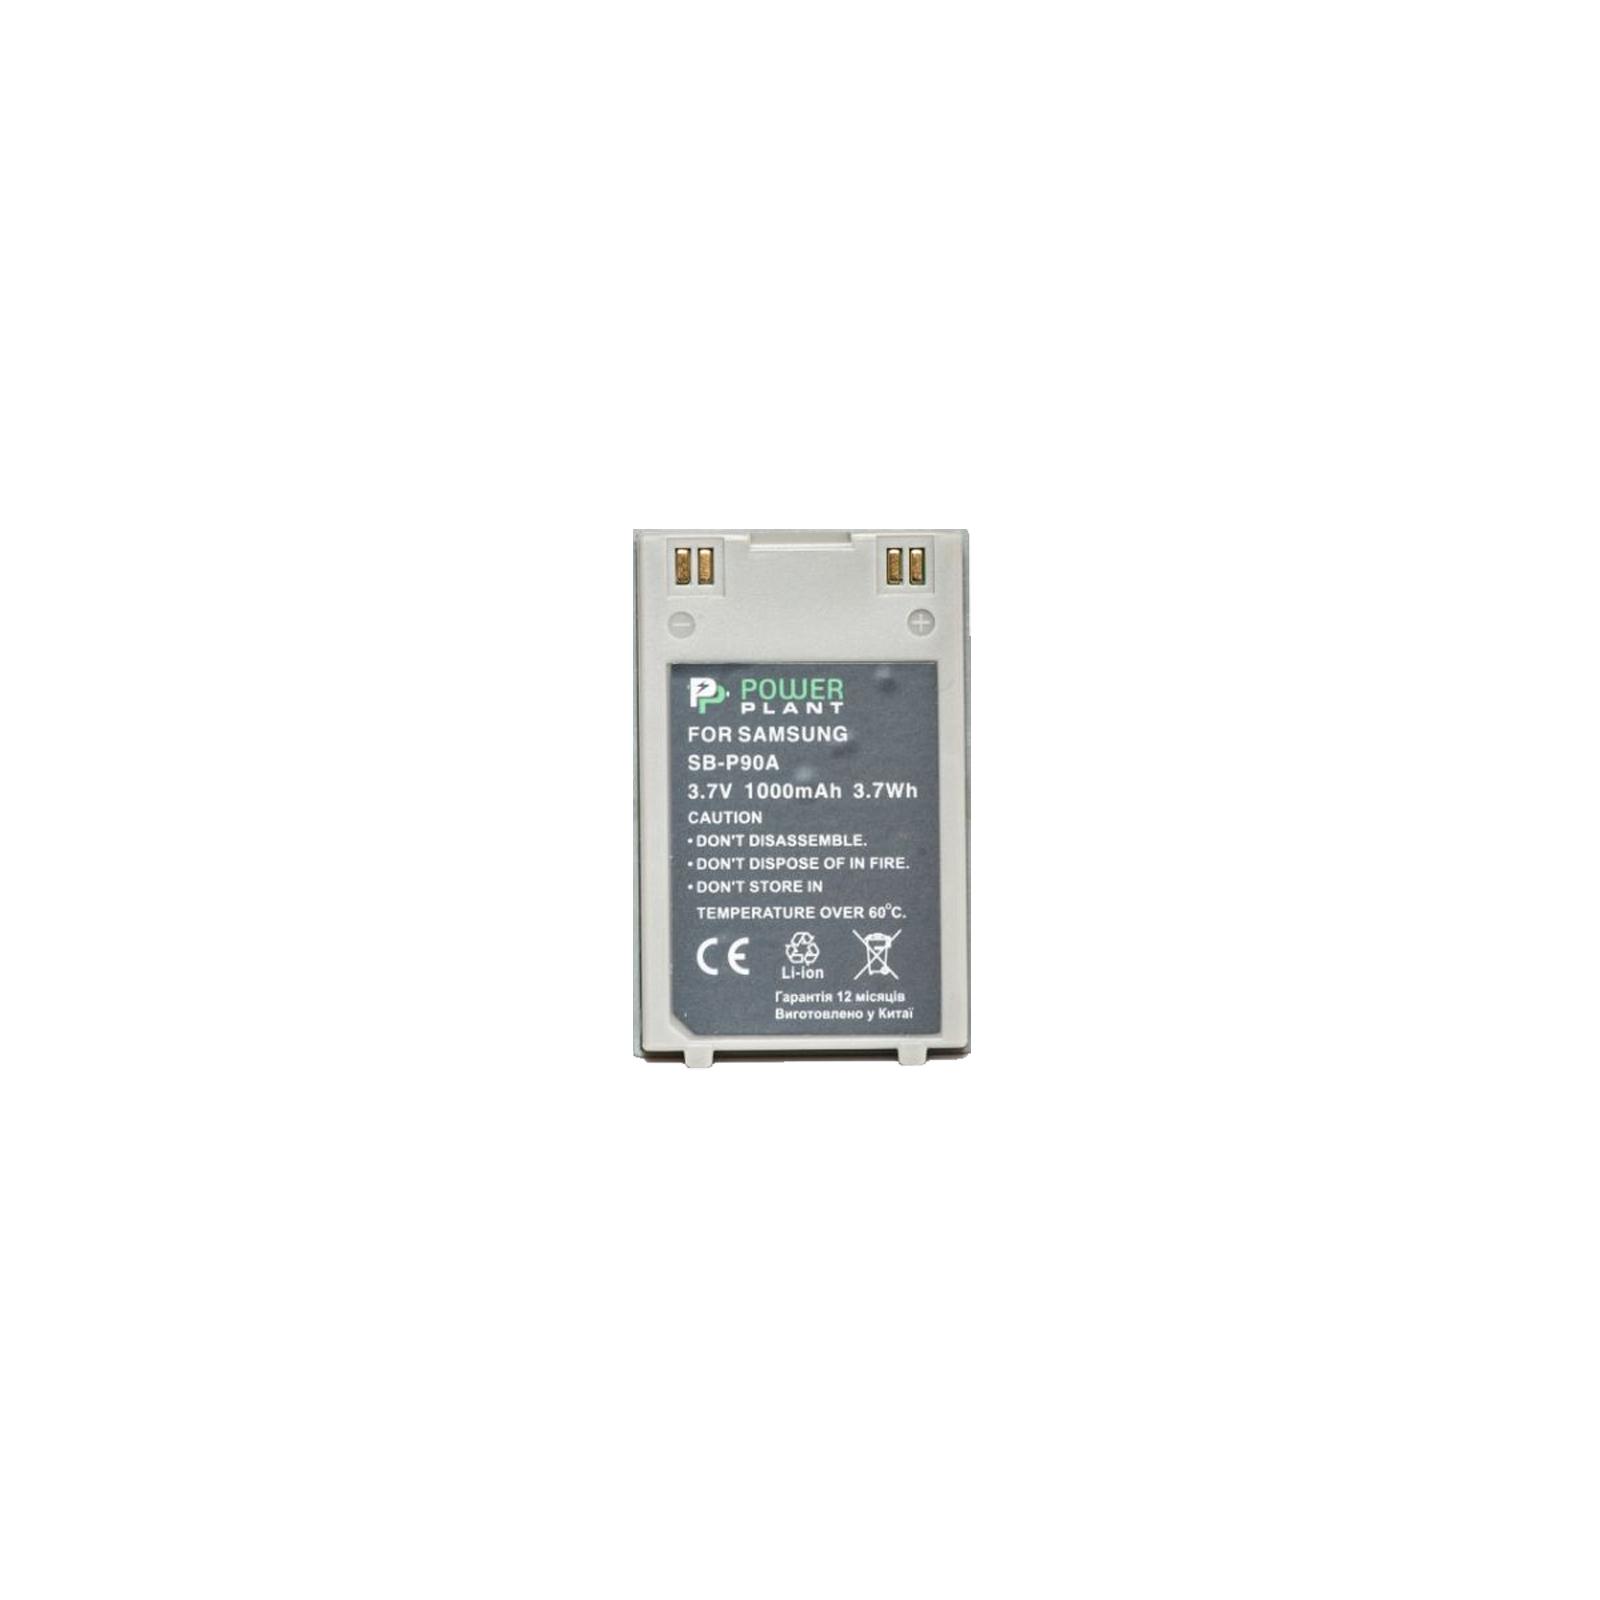 Аккумулятор к фото/видео PowerPlant Samsung SB-P90A (DV00DV1363)